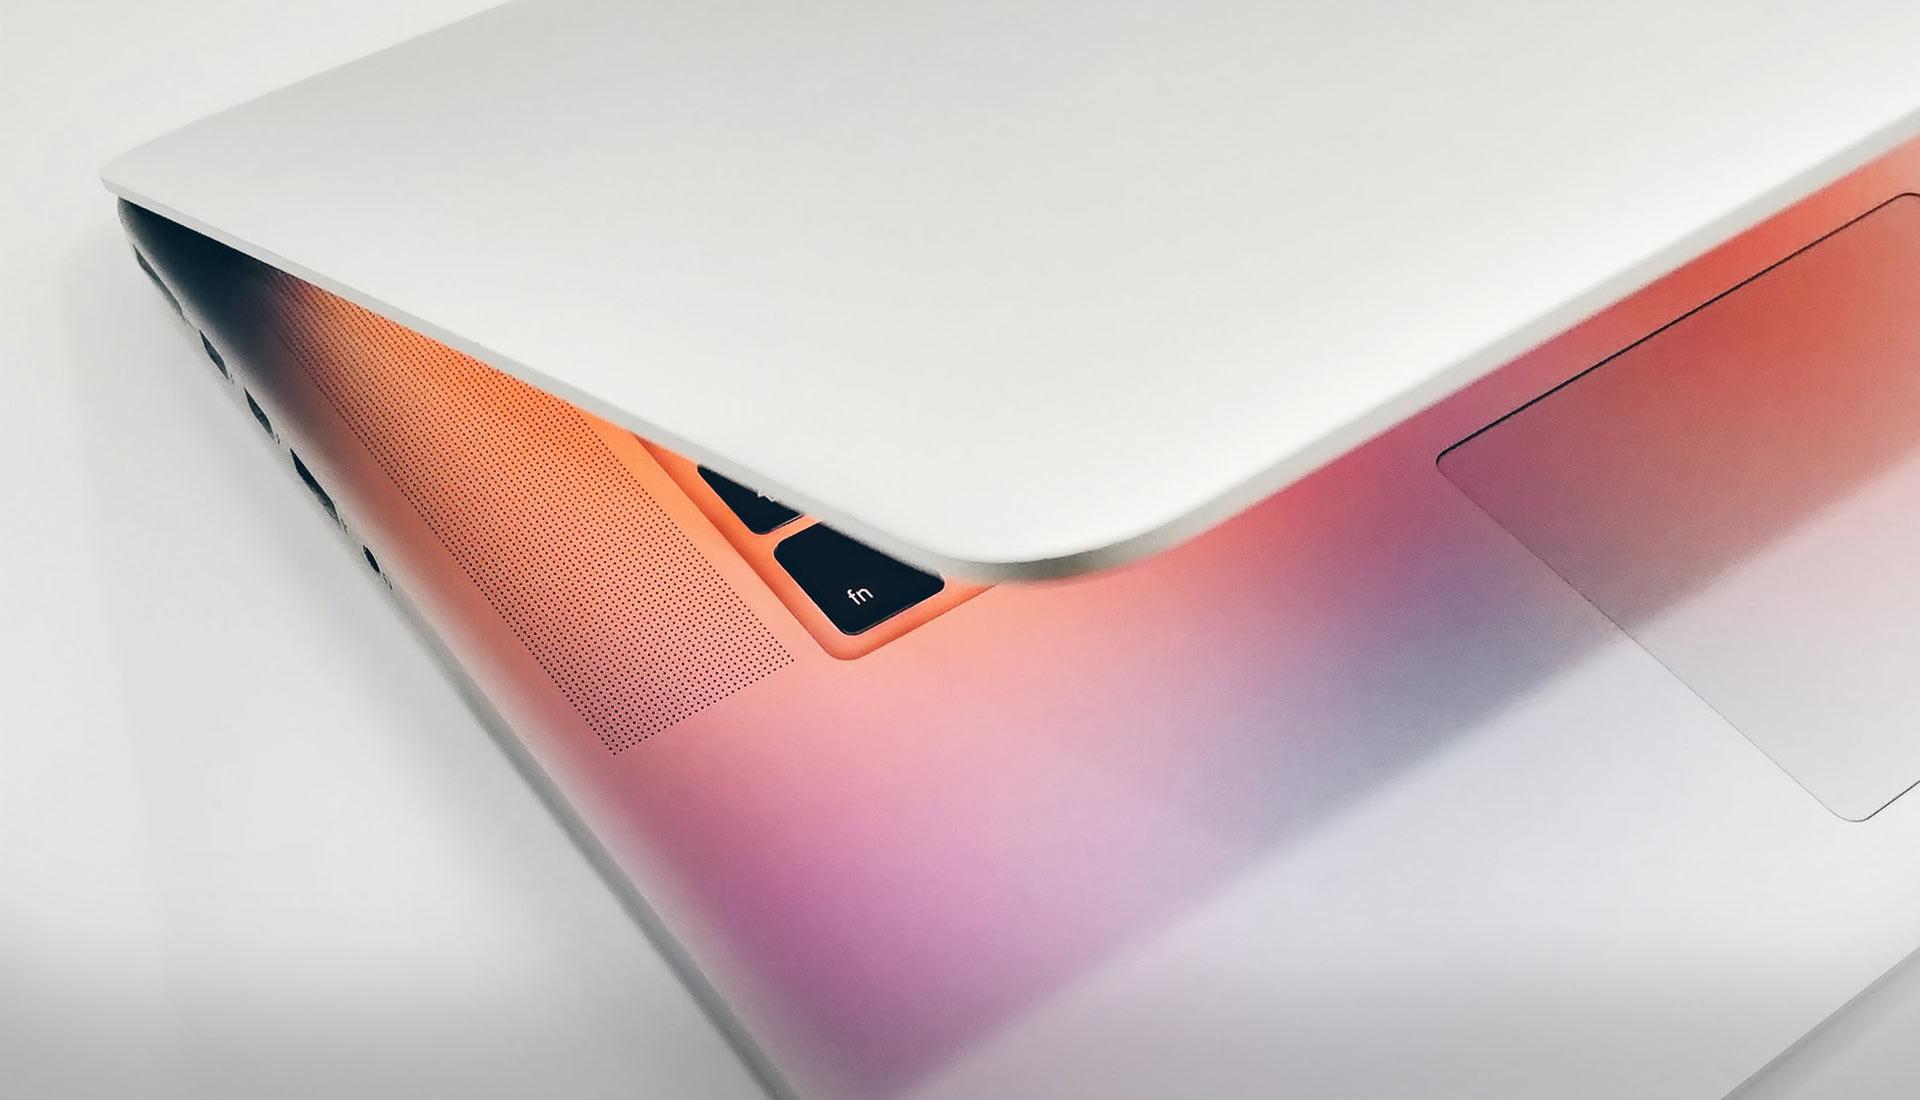 MacBook Pro half open with pinkish light